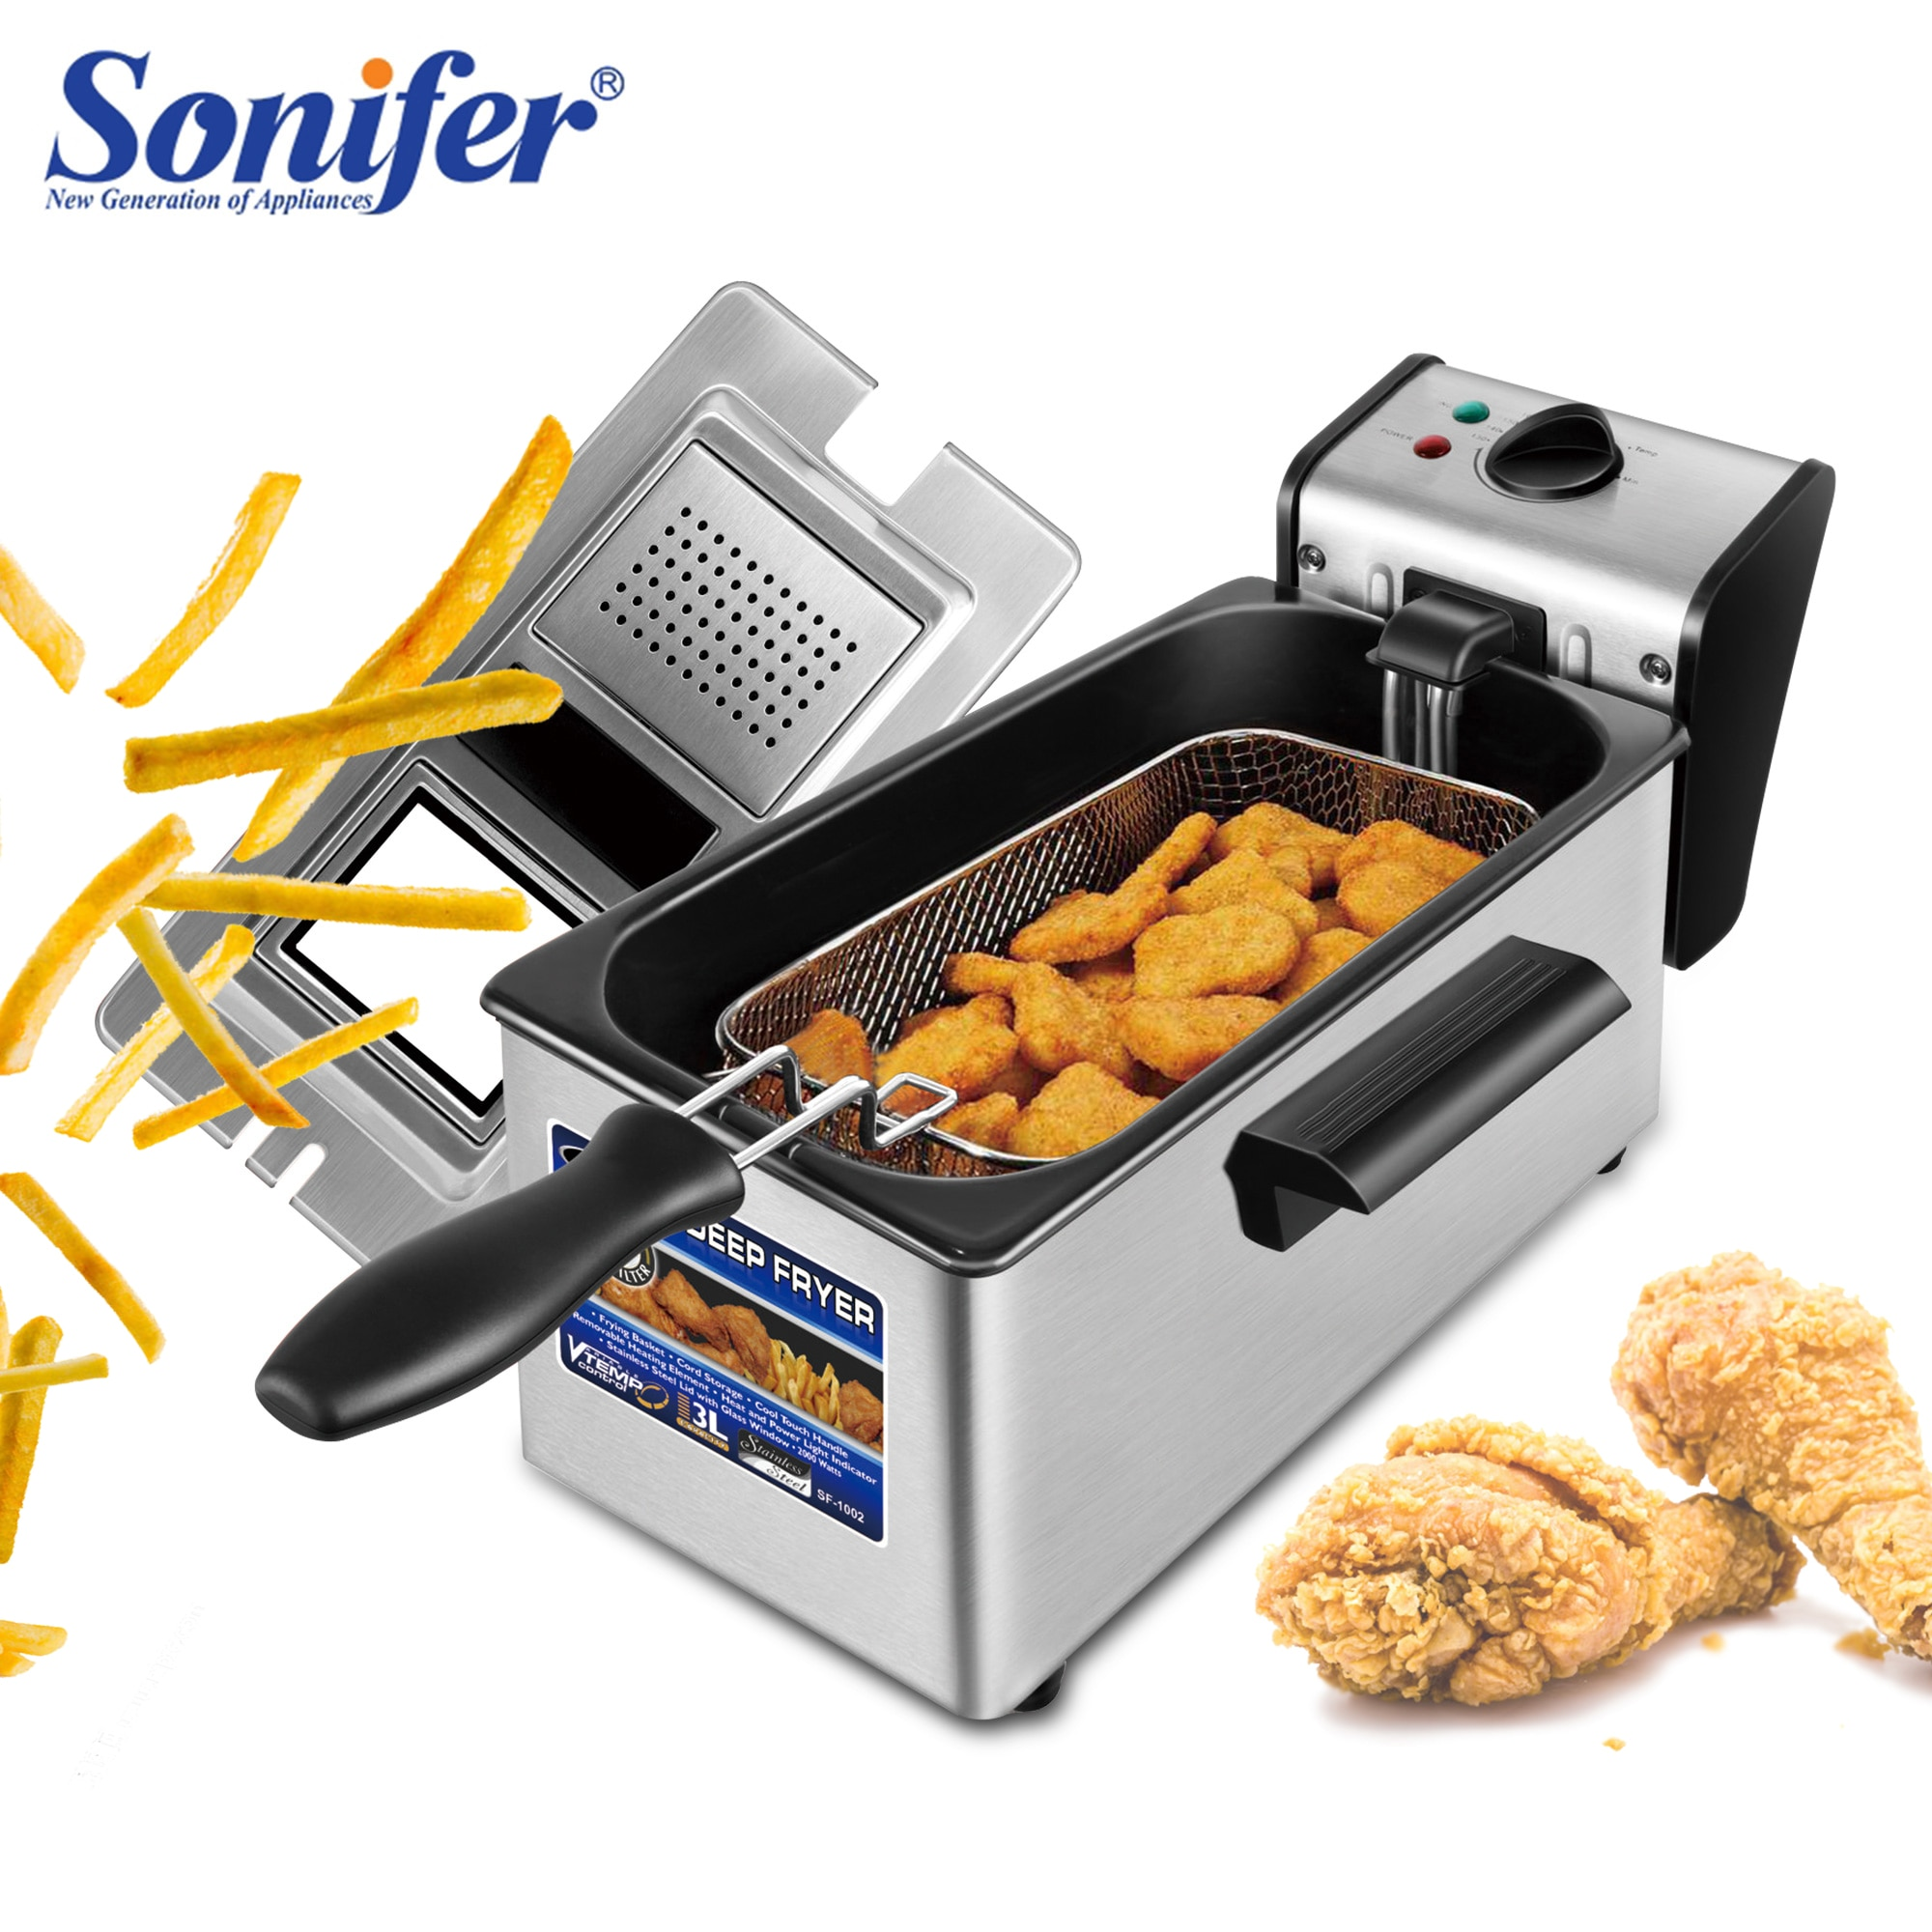 Freidora eléctrica 3L Frie freidora francesa olla caliente pollo frito parrilla termostato ajustable cocina Sonifer